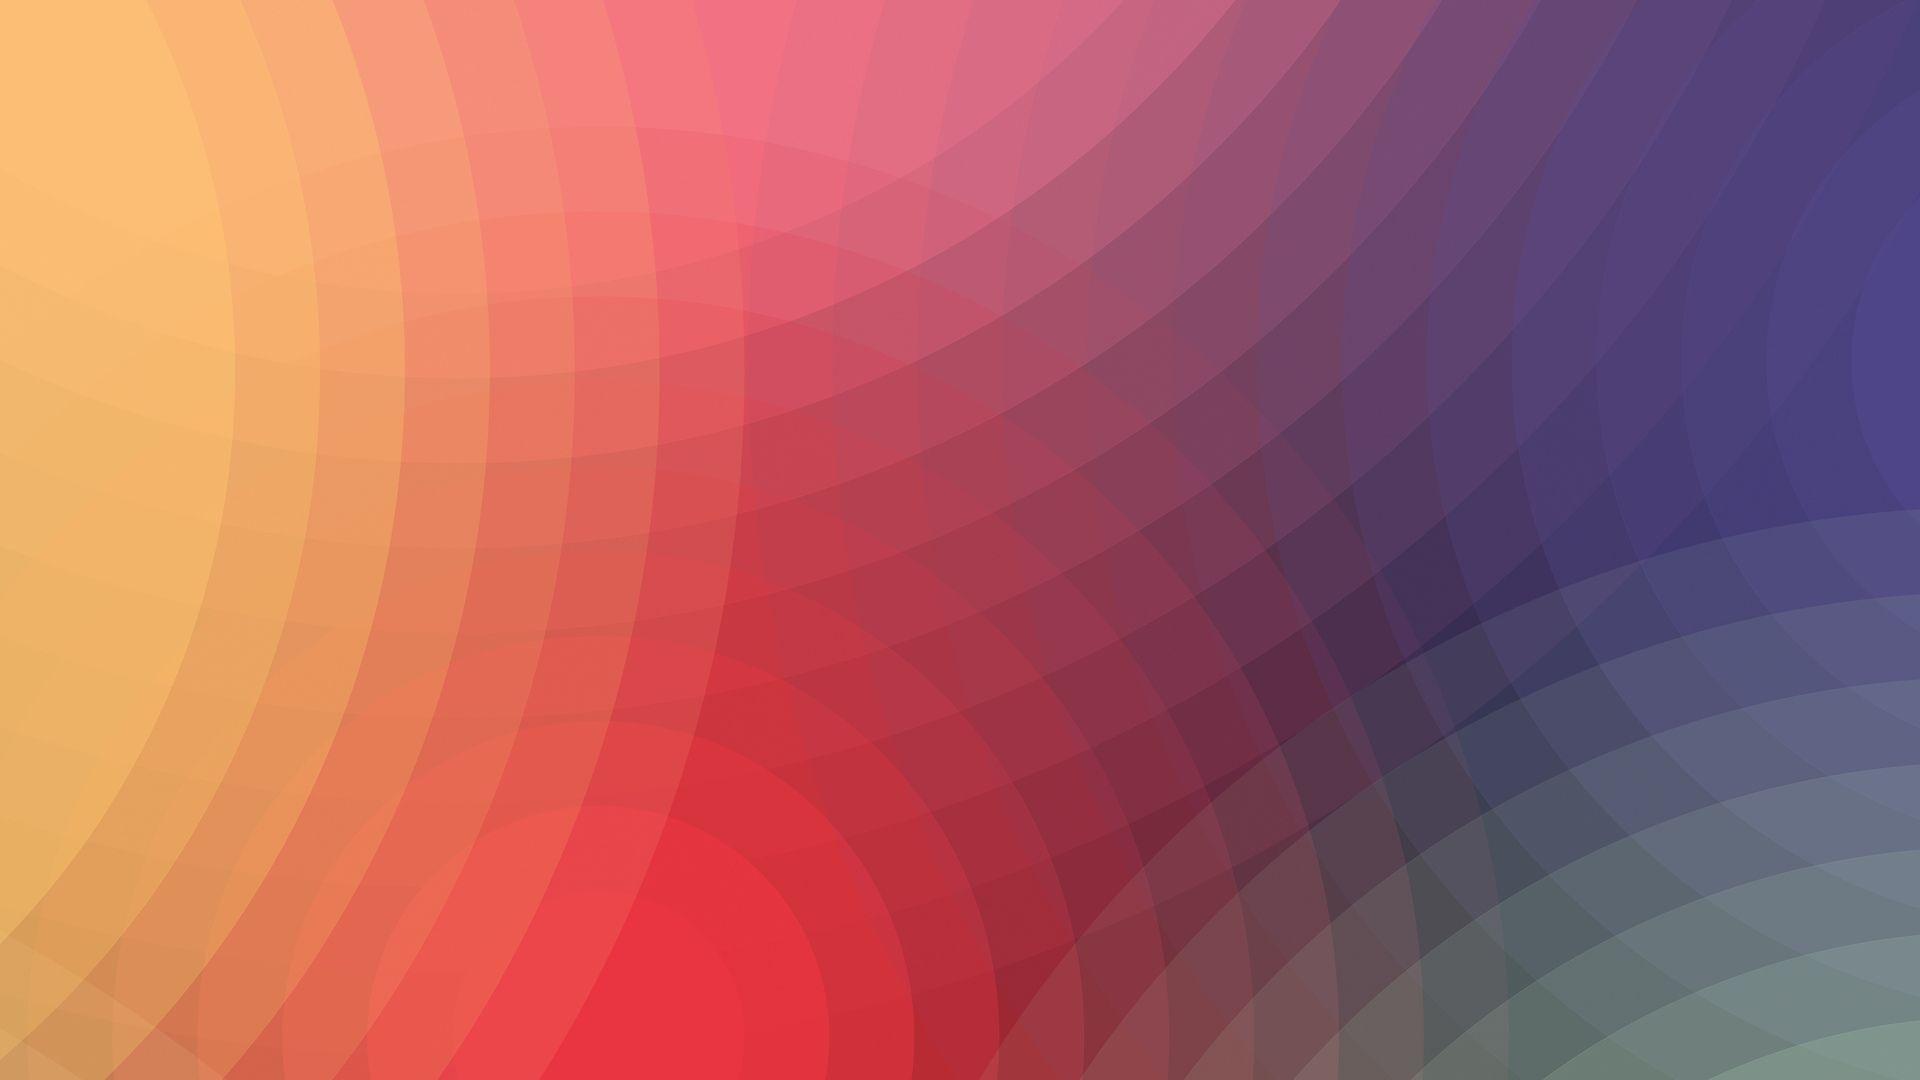 Bright hd wallpaper download